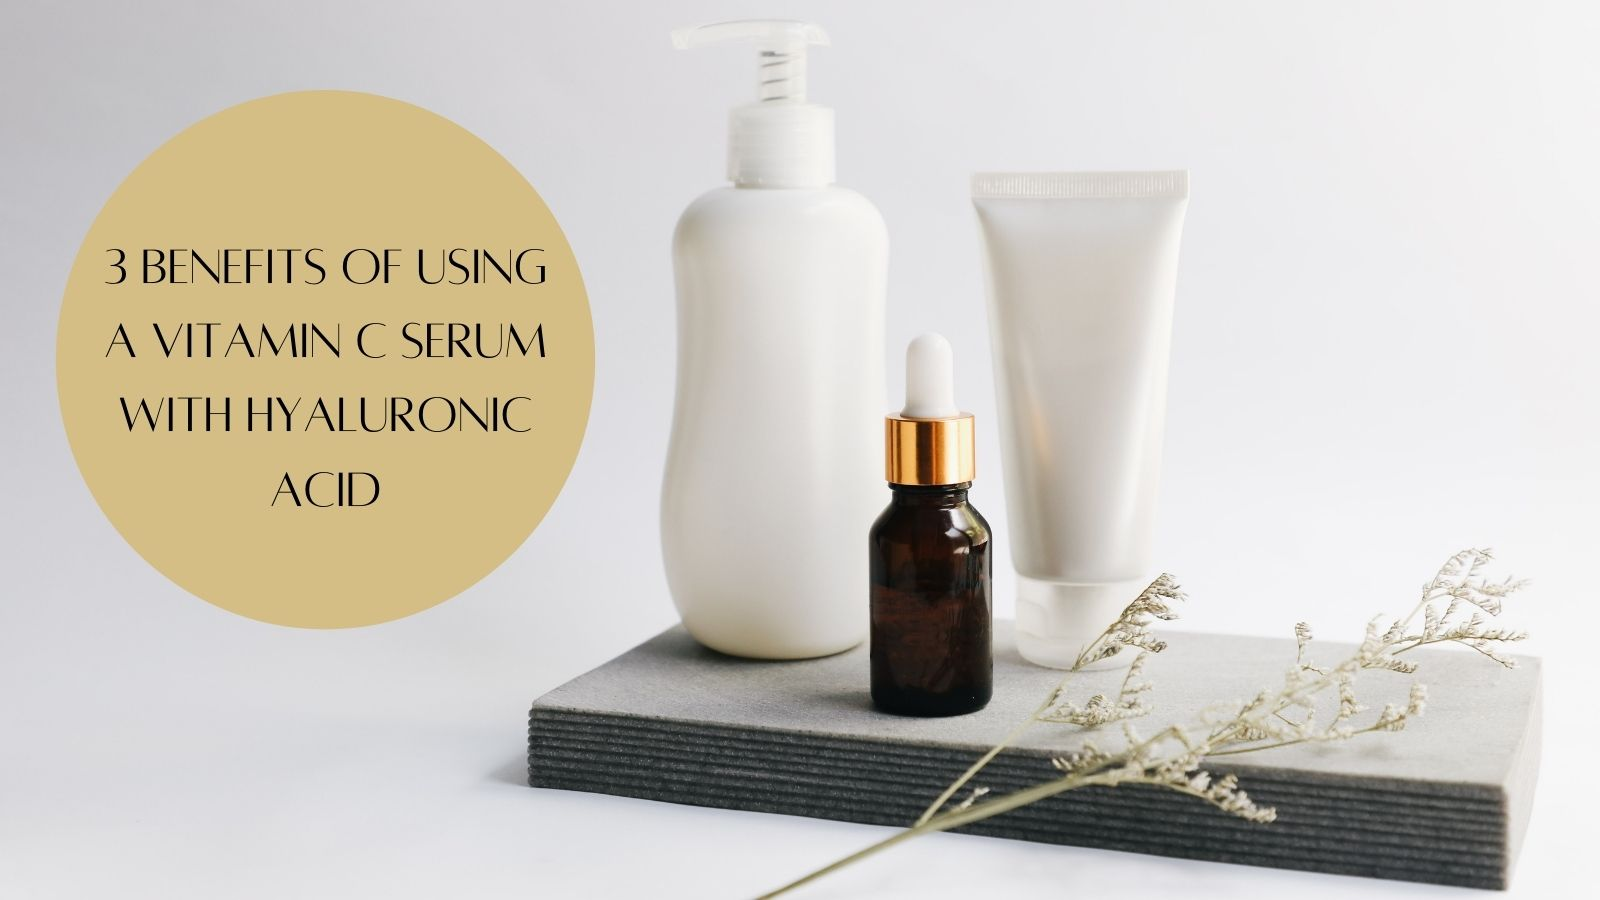 Vitamin C Serum With Hyaluronic Acid - Skincare Bottle